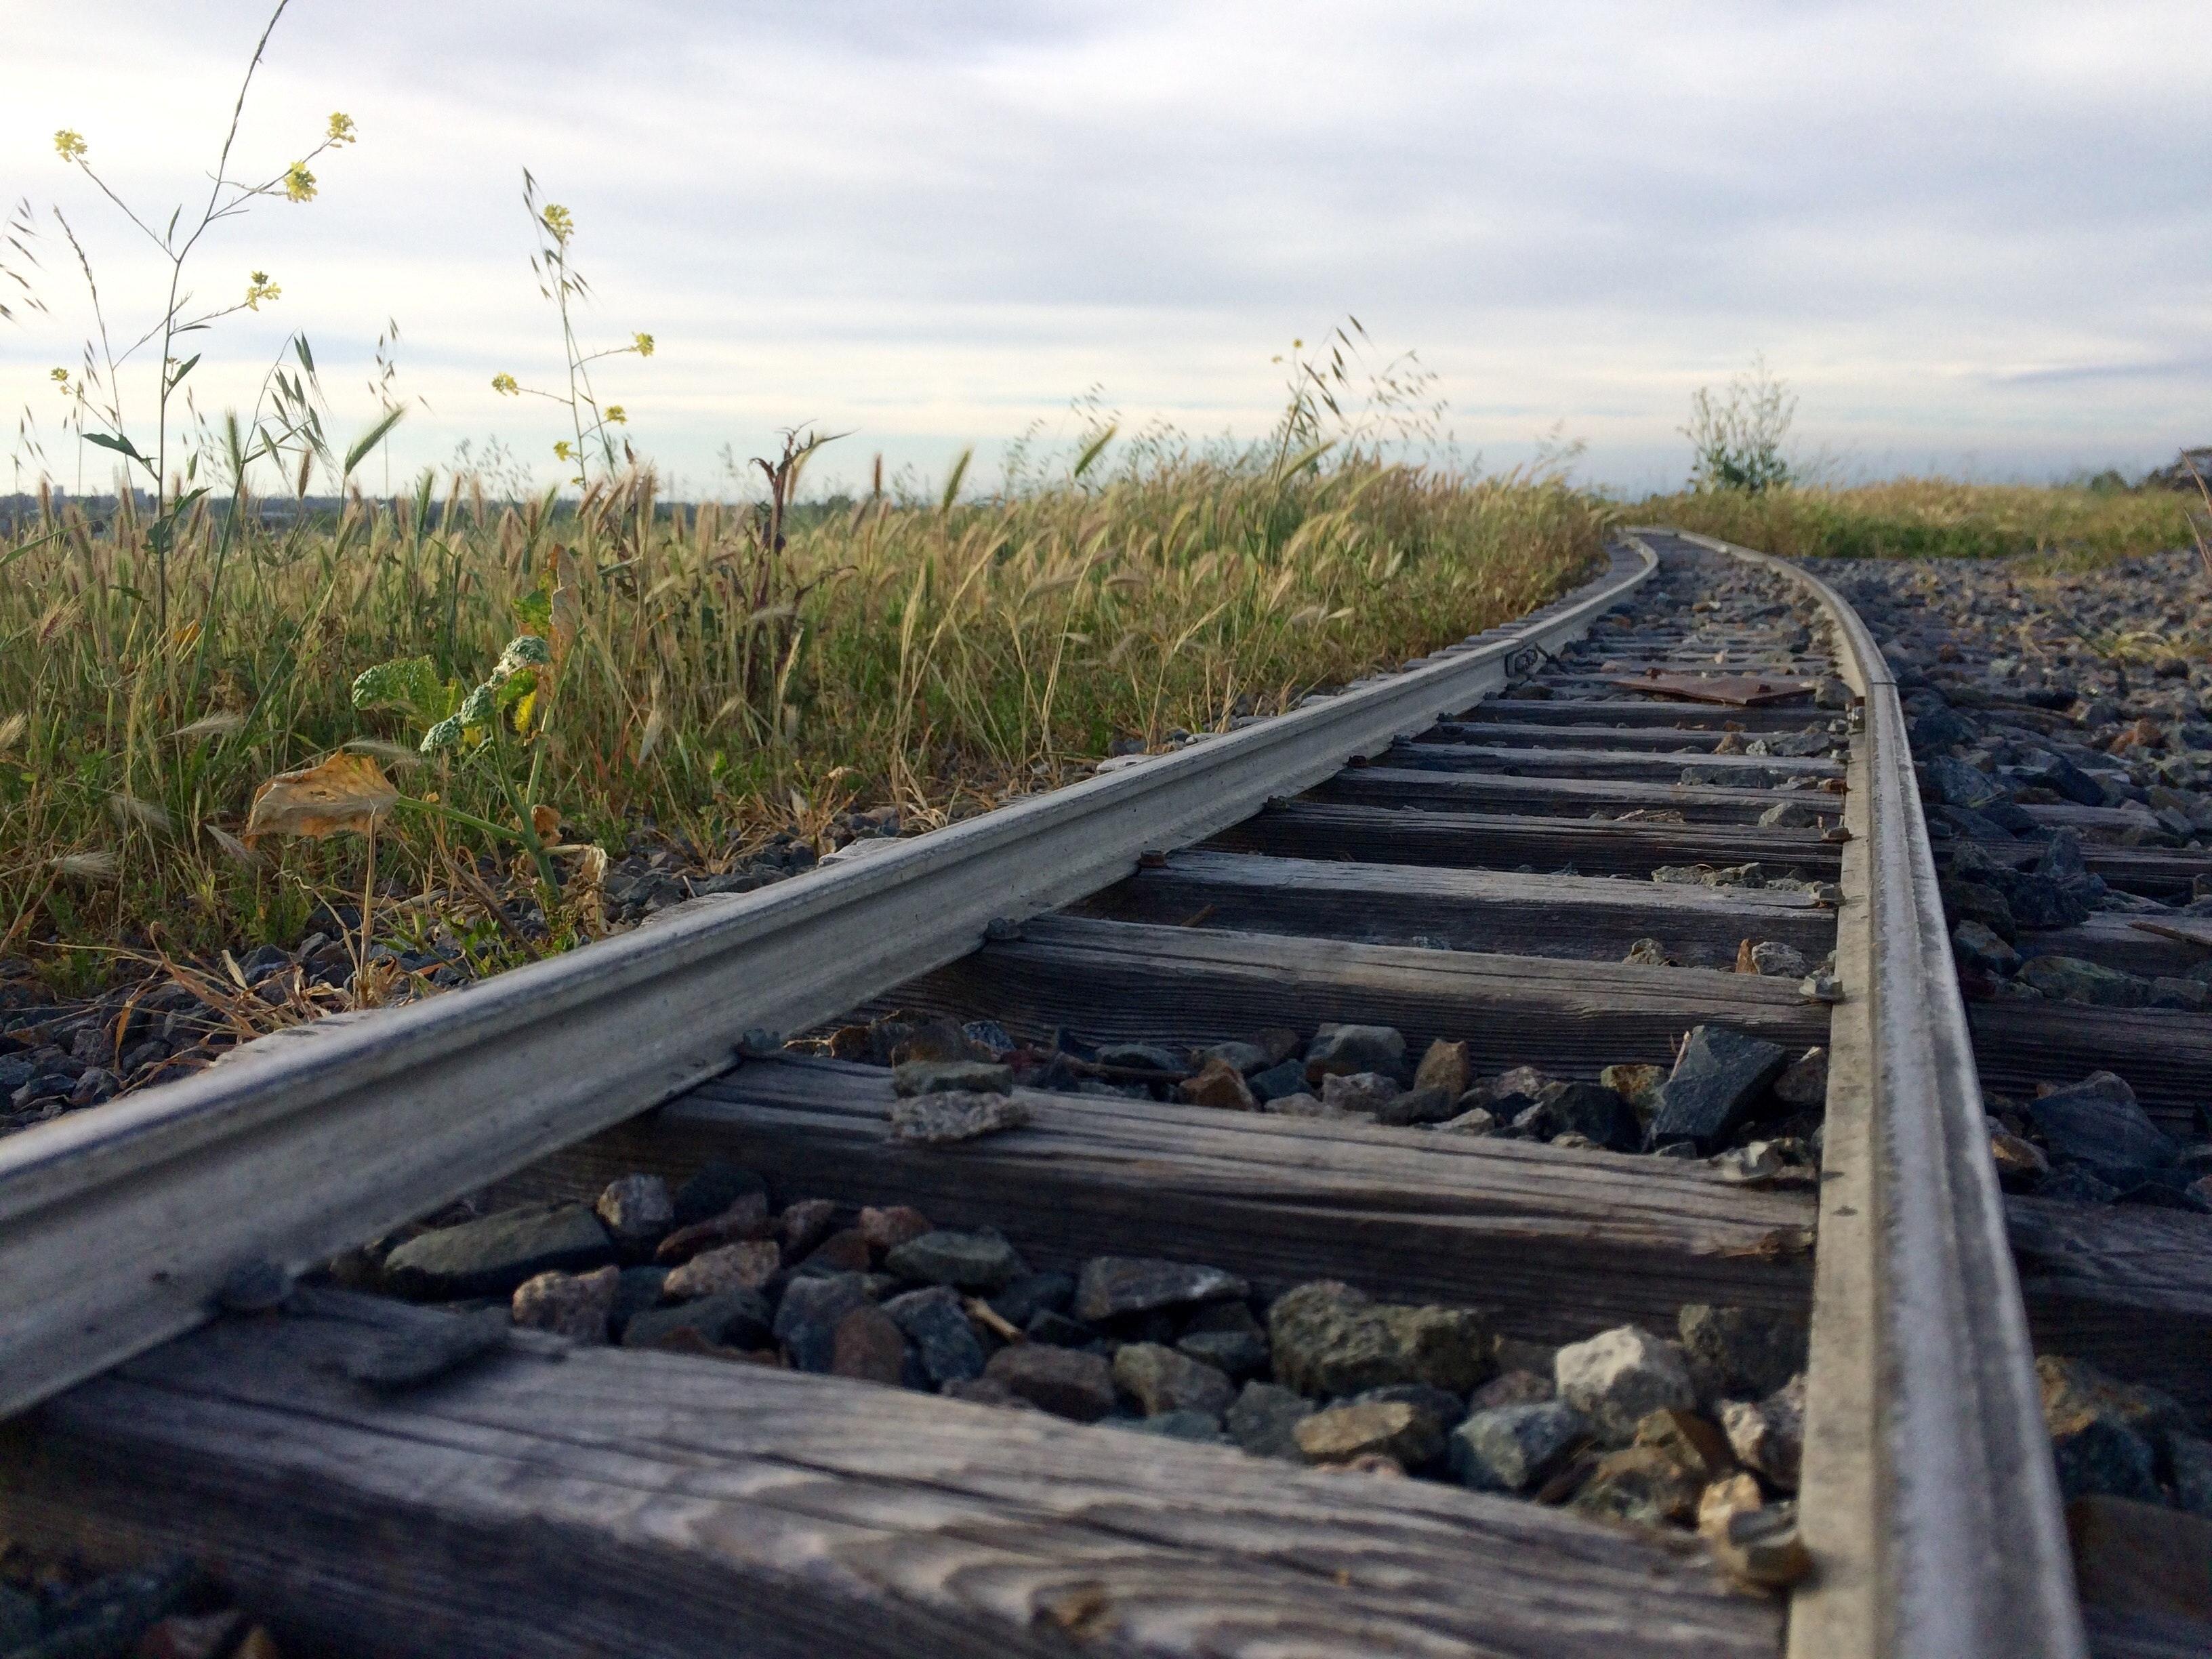 Railroad Track Against Sky, Railway, Wood, Travel, Transportation system, HQ Photo